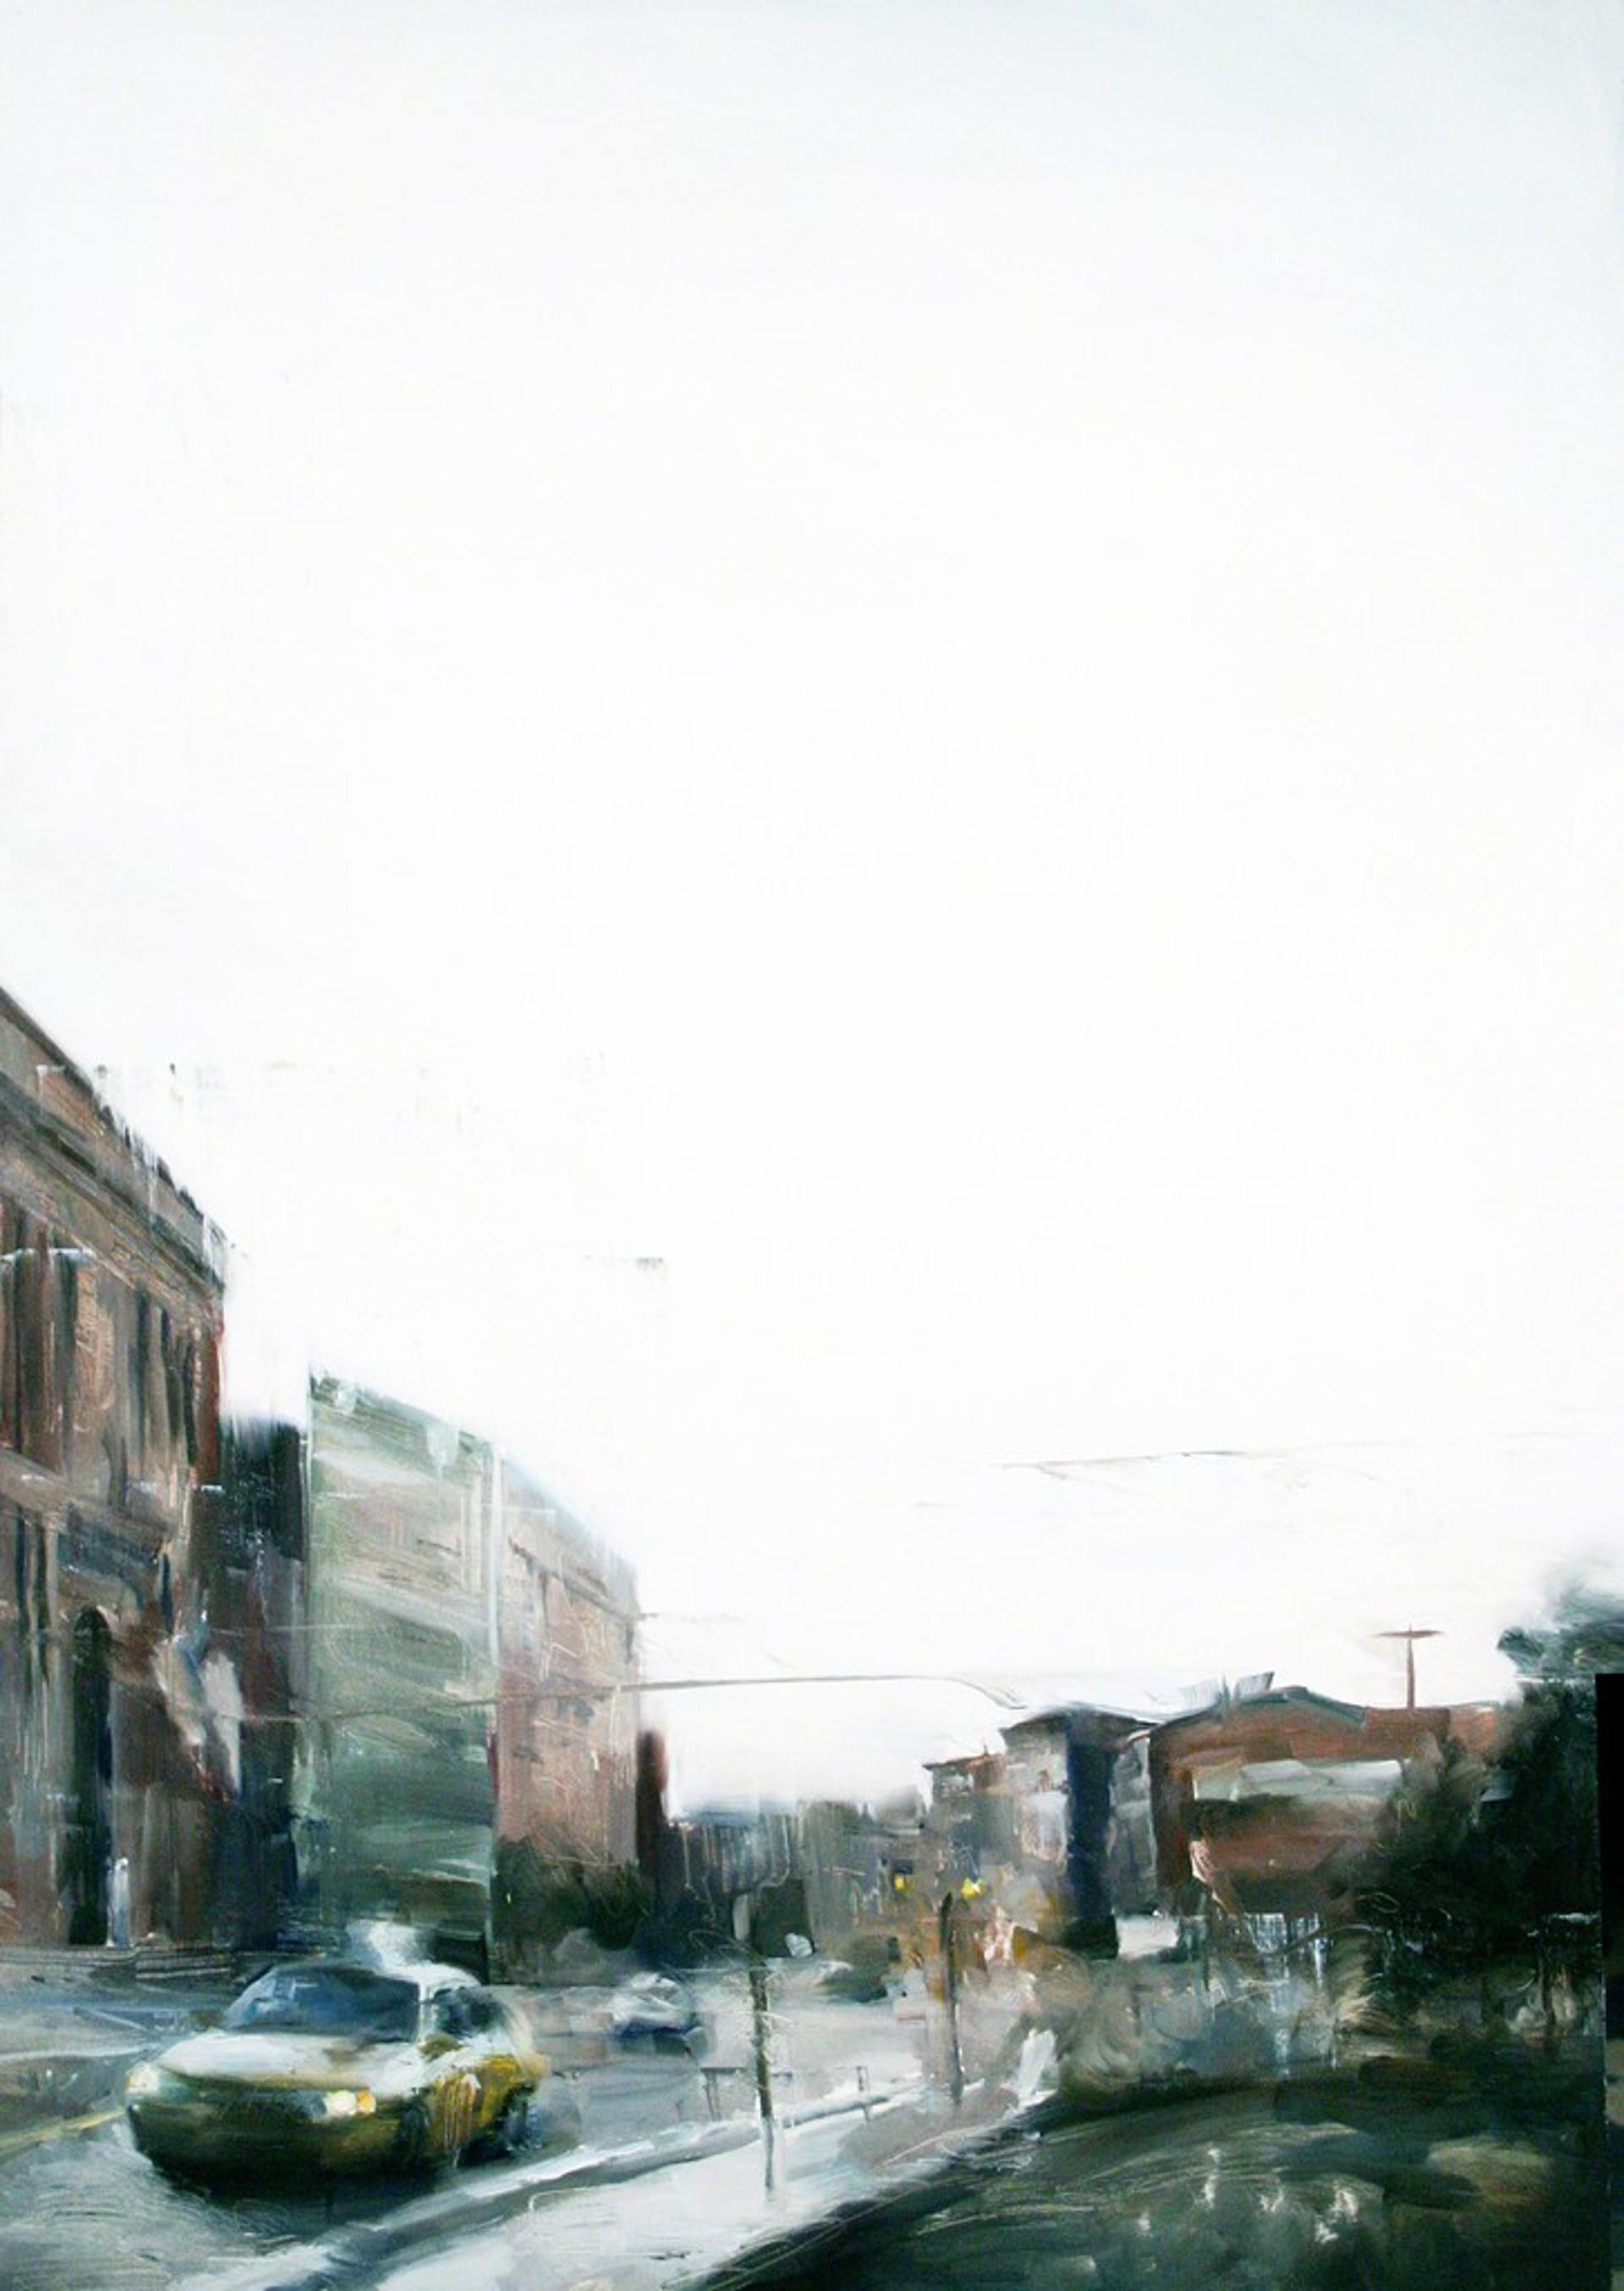 Tuesday by Britt Snyder